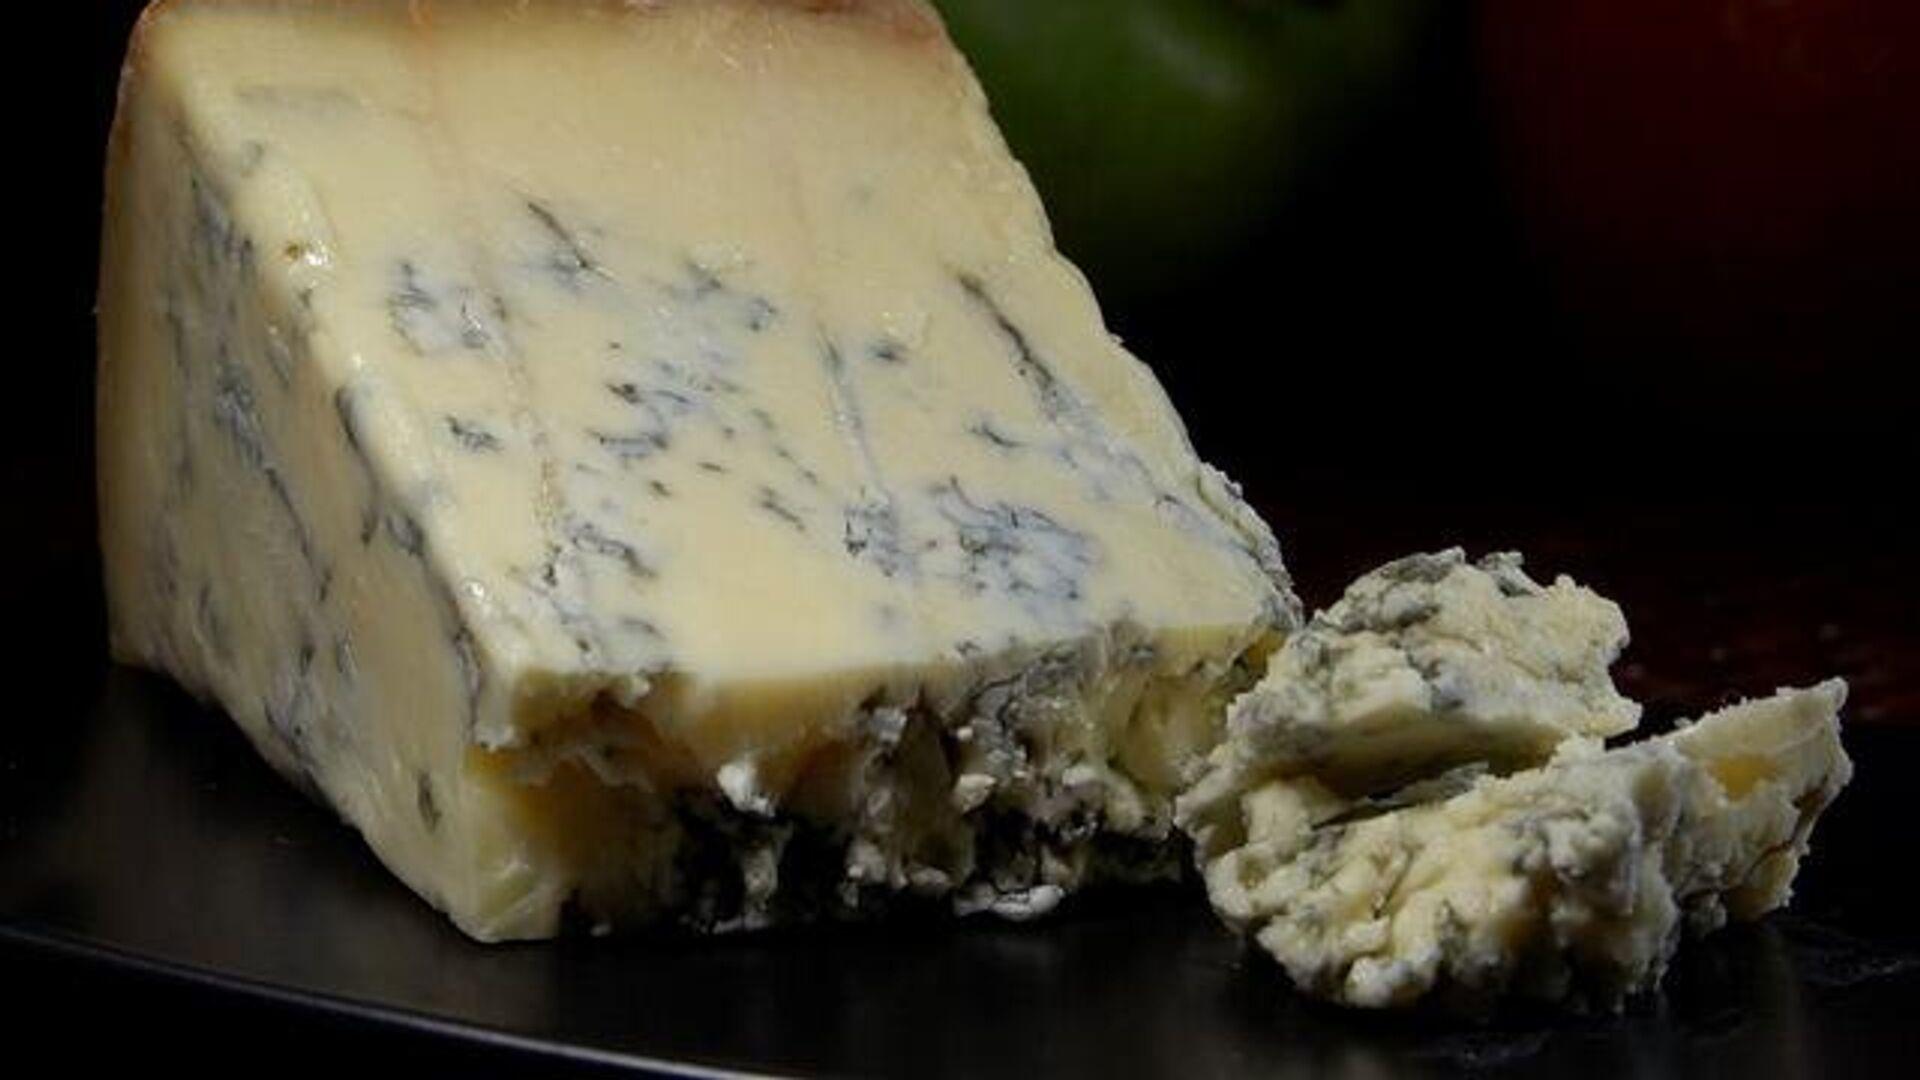 formaggio blu - Sputnik Italia, 1920, 14.10.2021